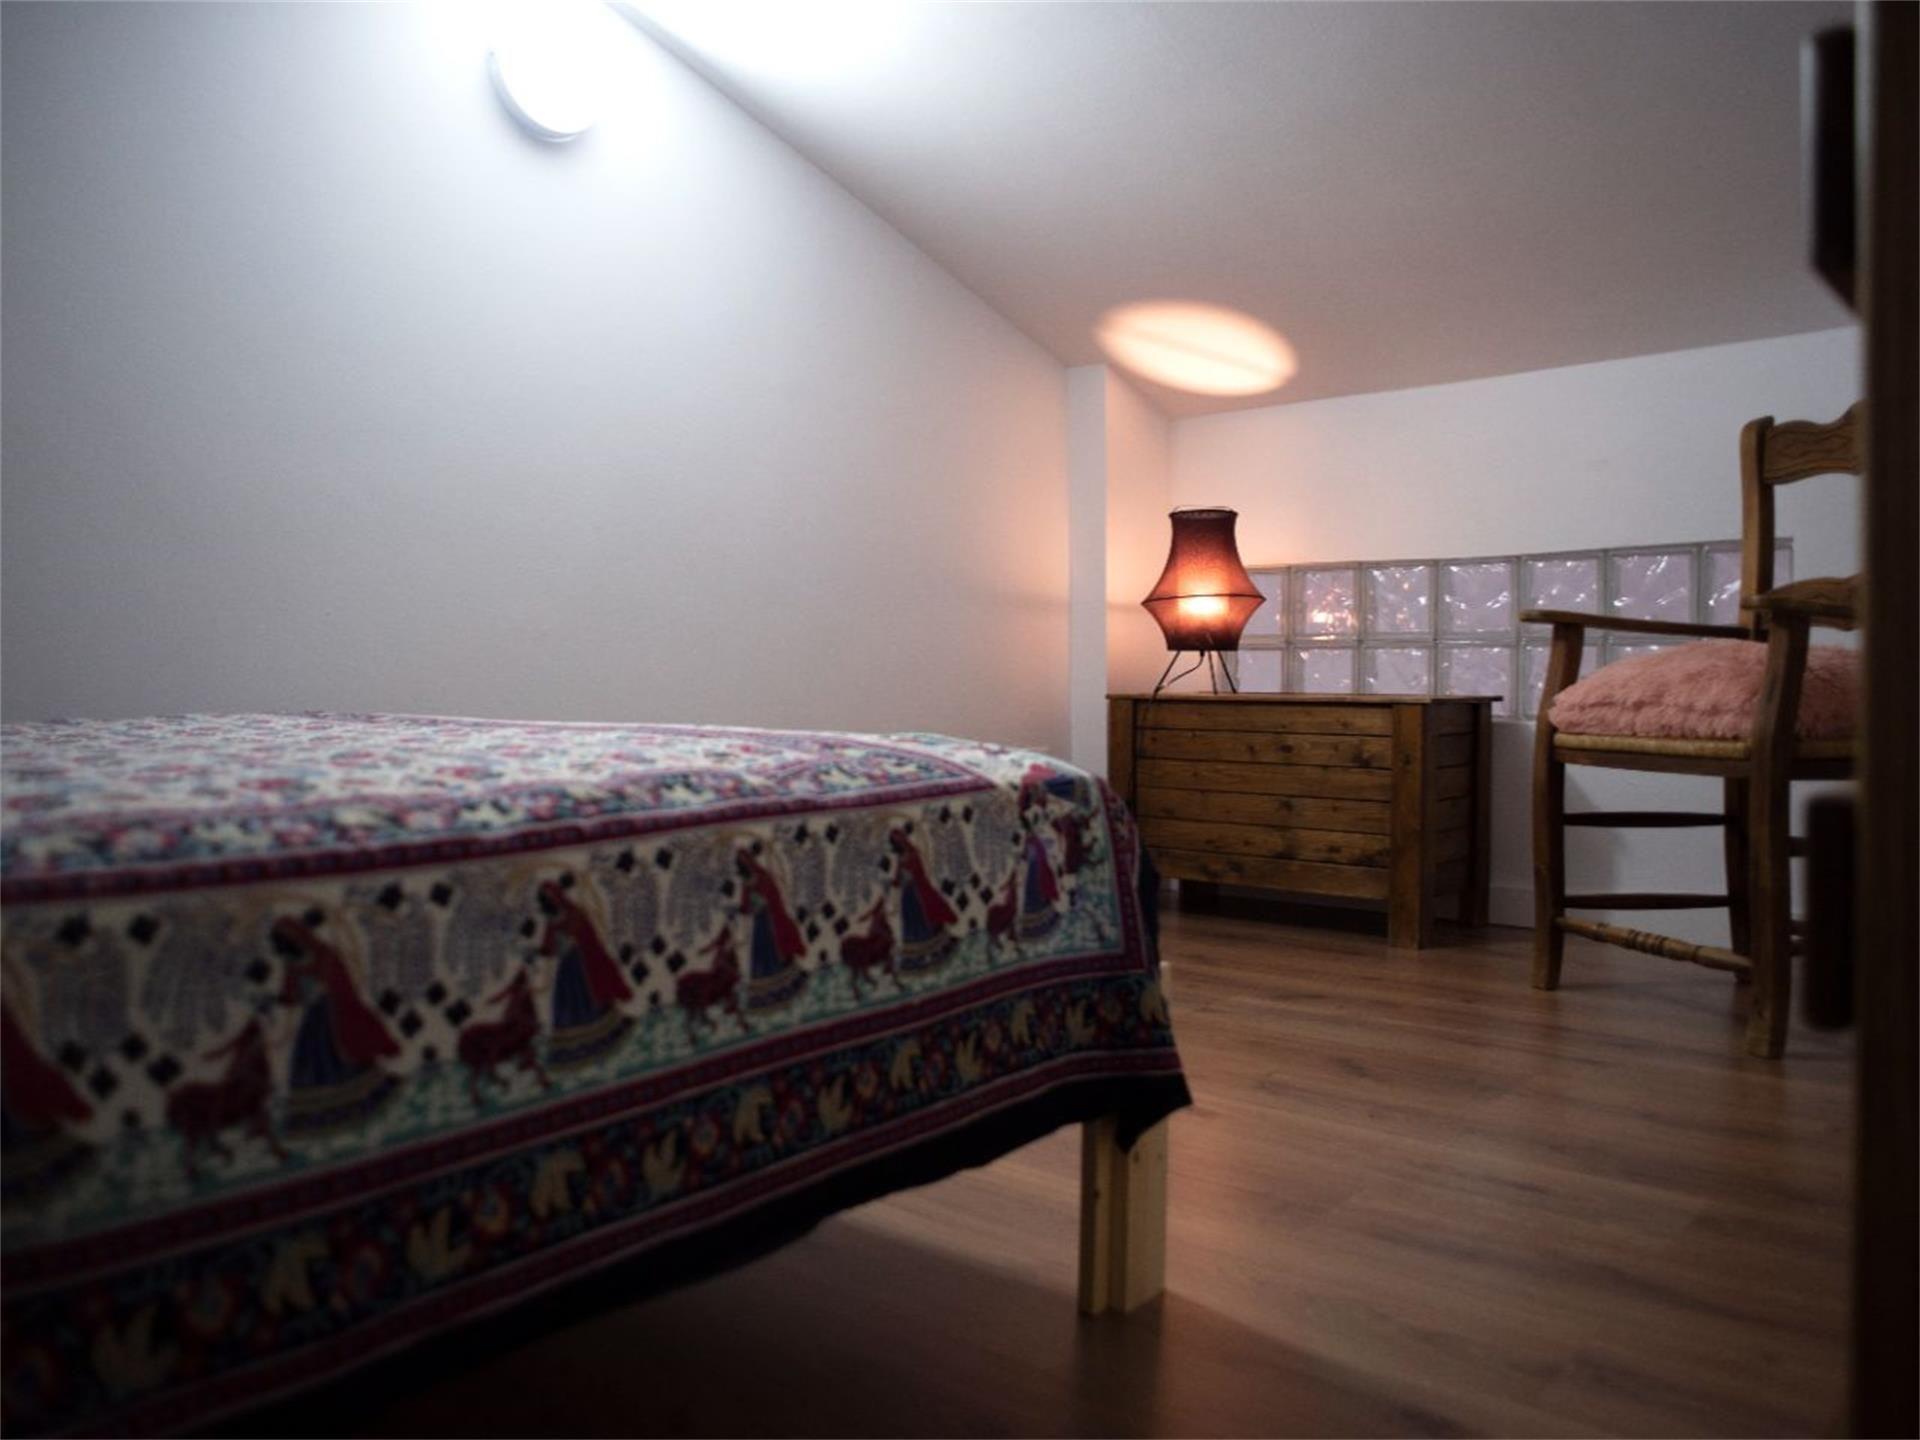 Casa adosada de alquiler en Calle José Montes, 20, Arriate (Arriate, Málaga)